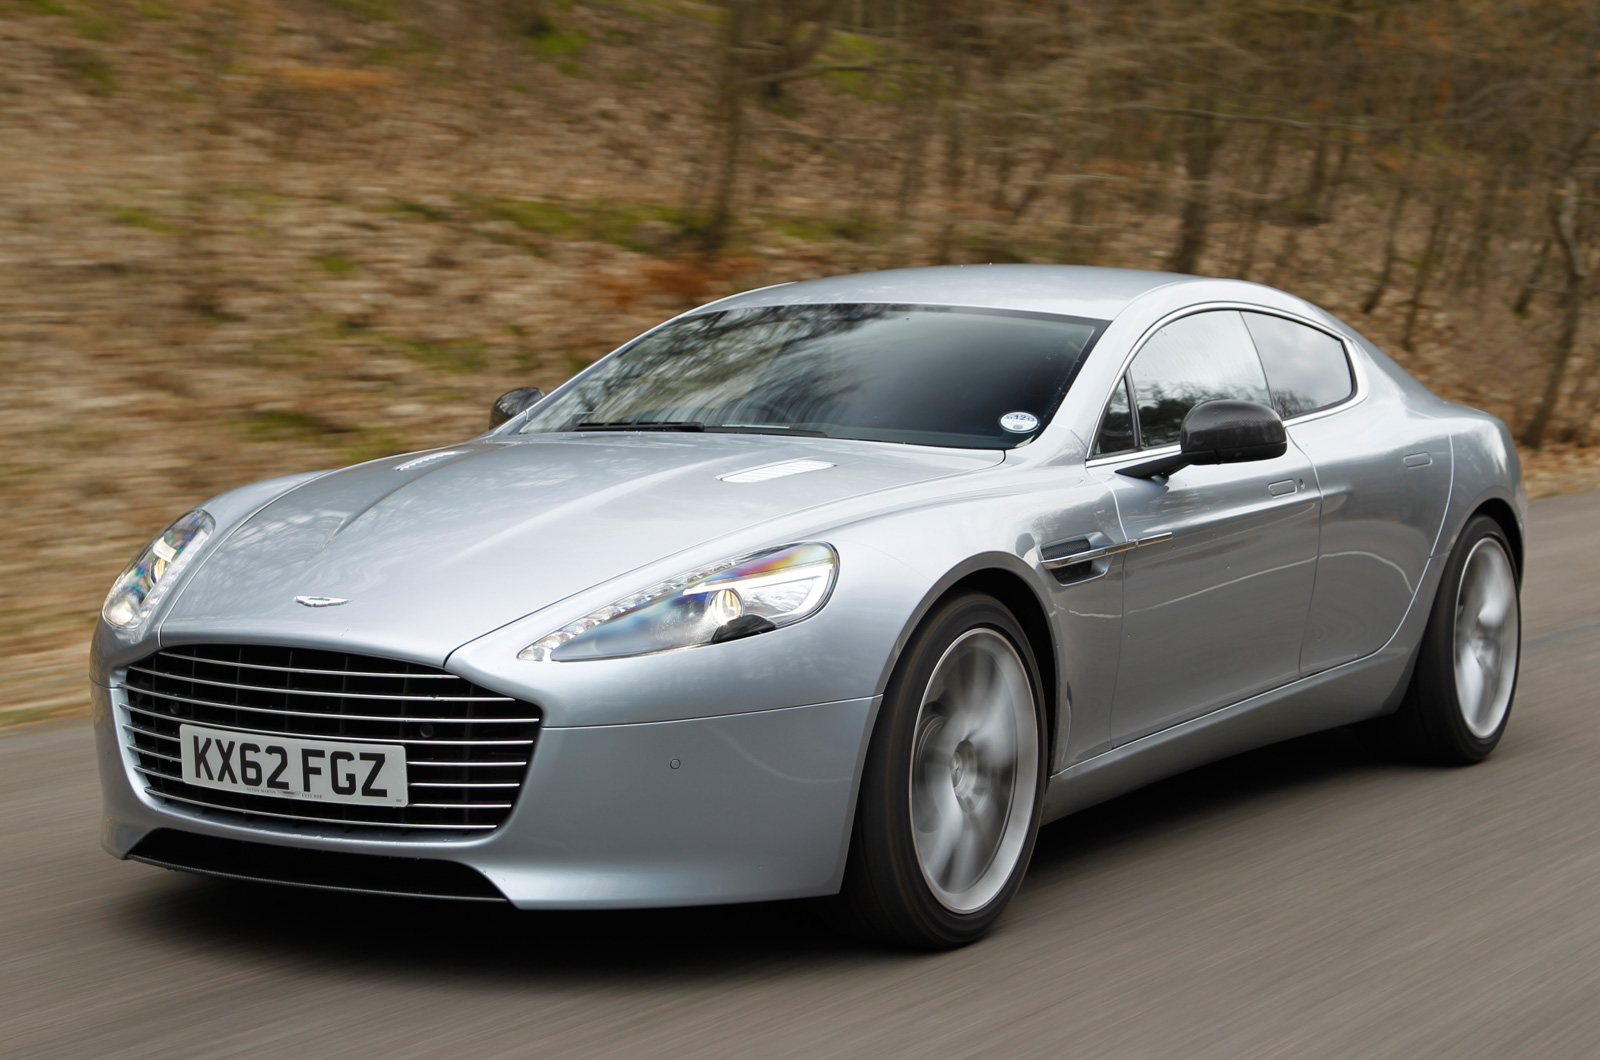 Aston Martin Rapide S Review (13) | Autocar | aston martin rapide review